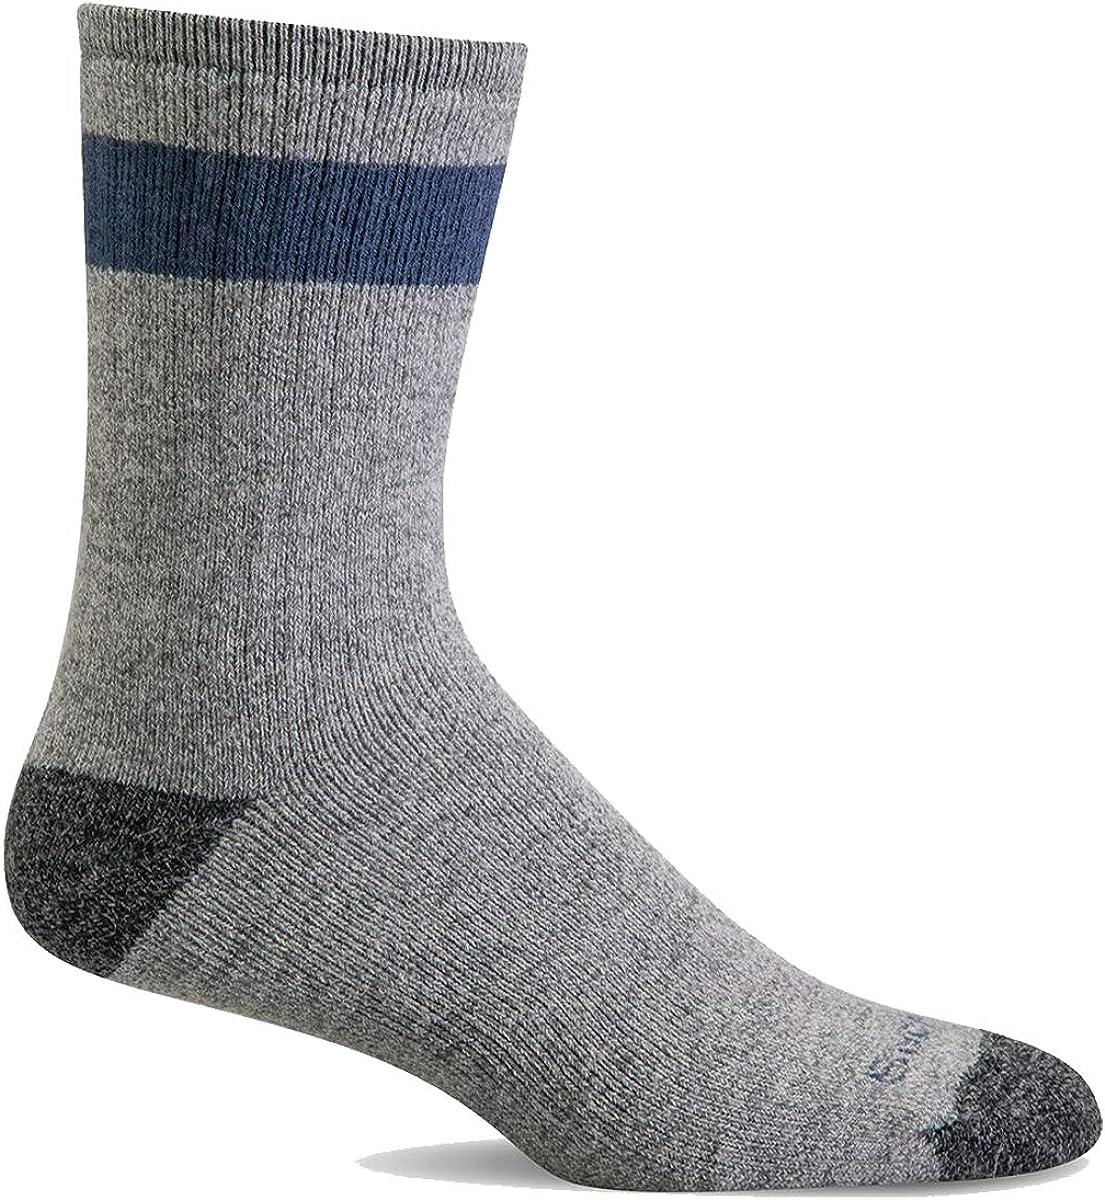 Sockwell Men's Rover II Crew Sock